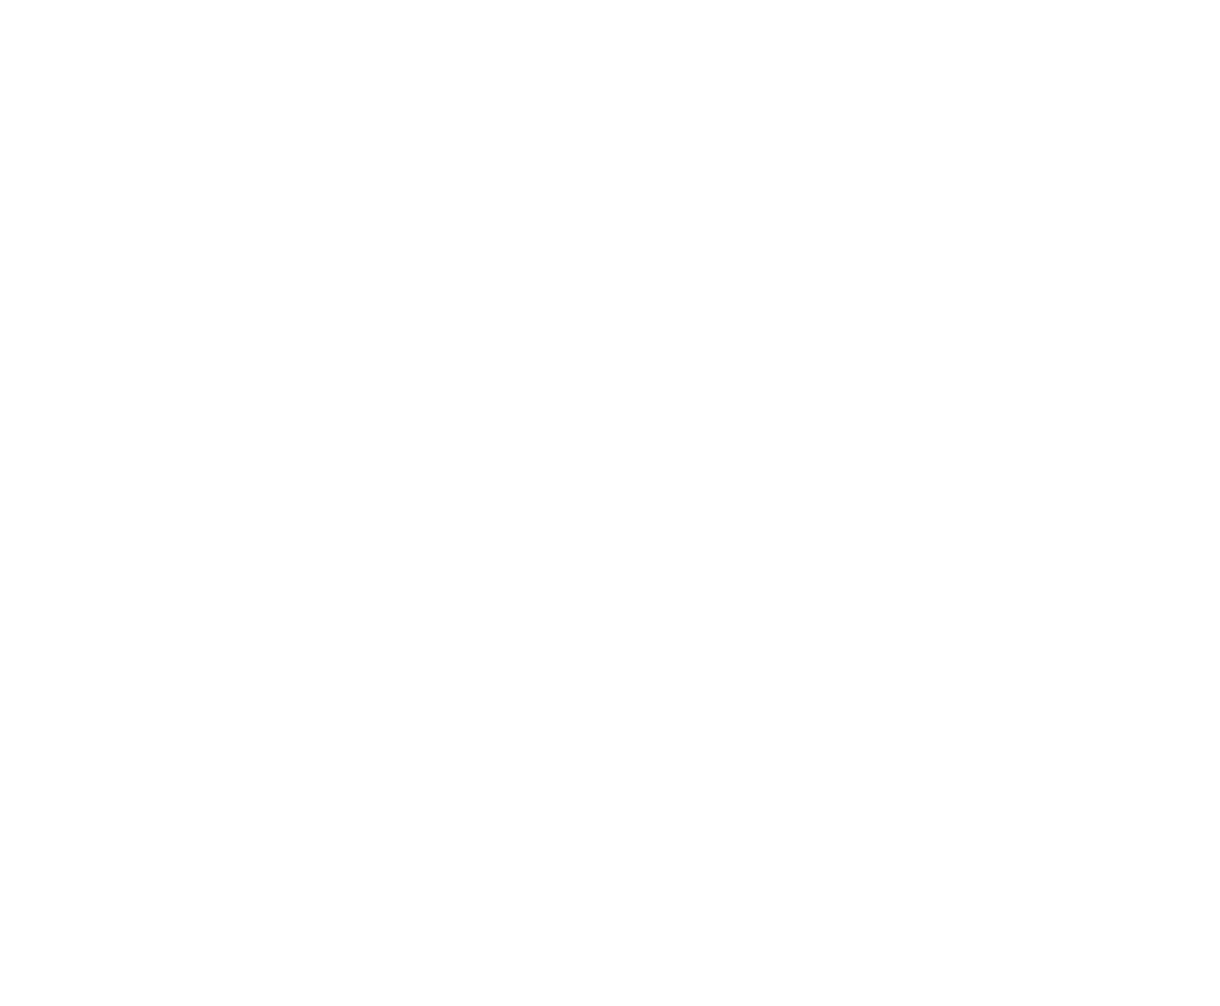 Acta Profetiskole